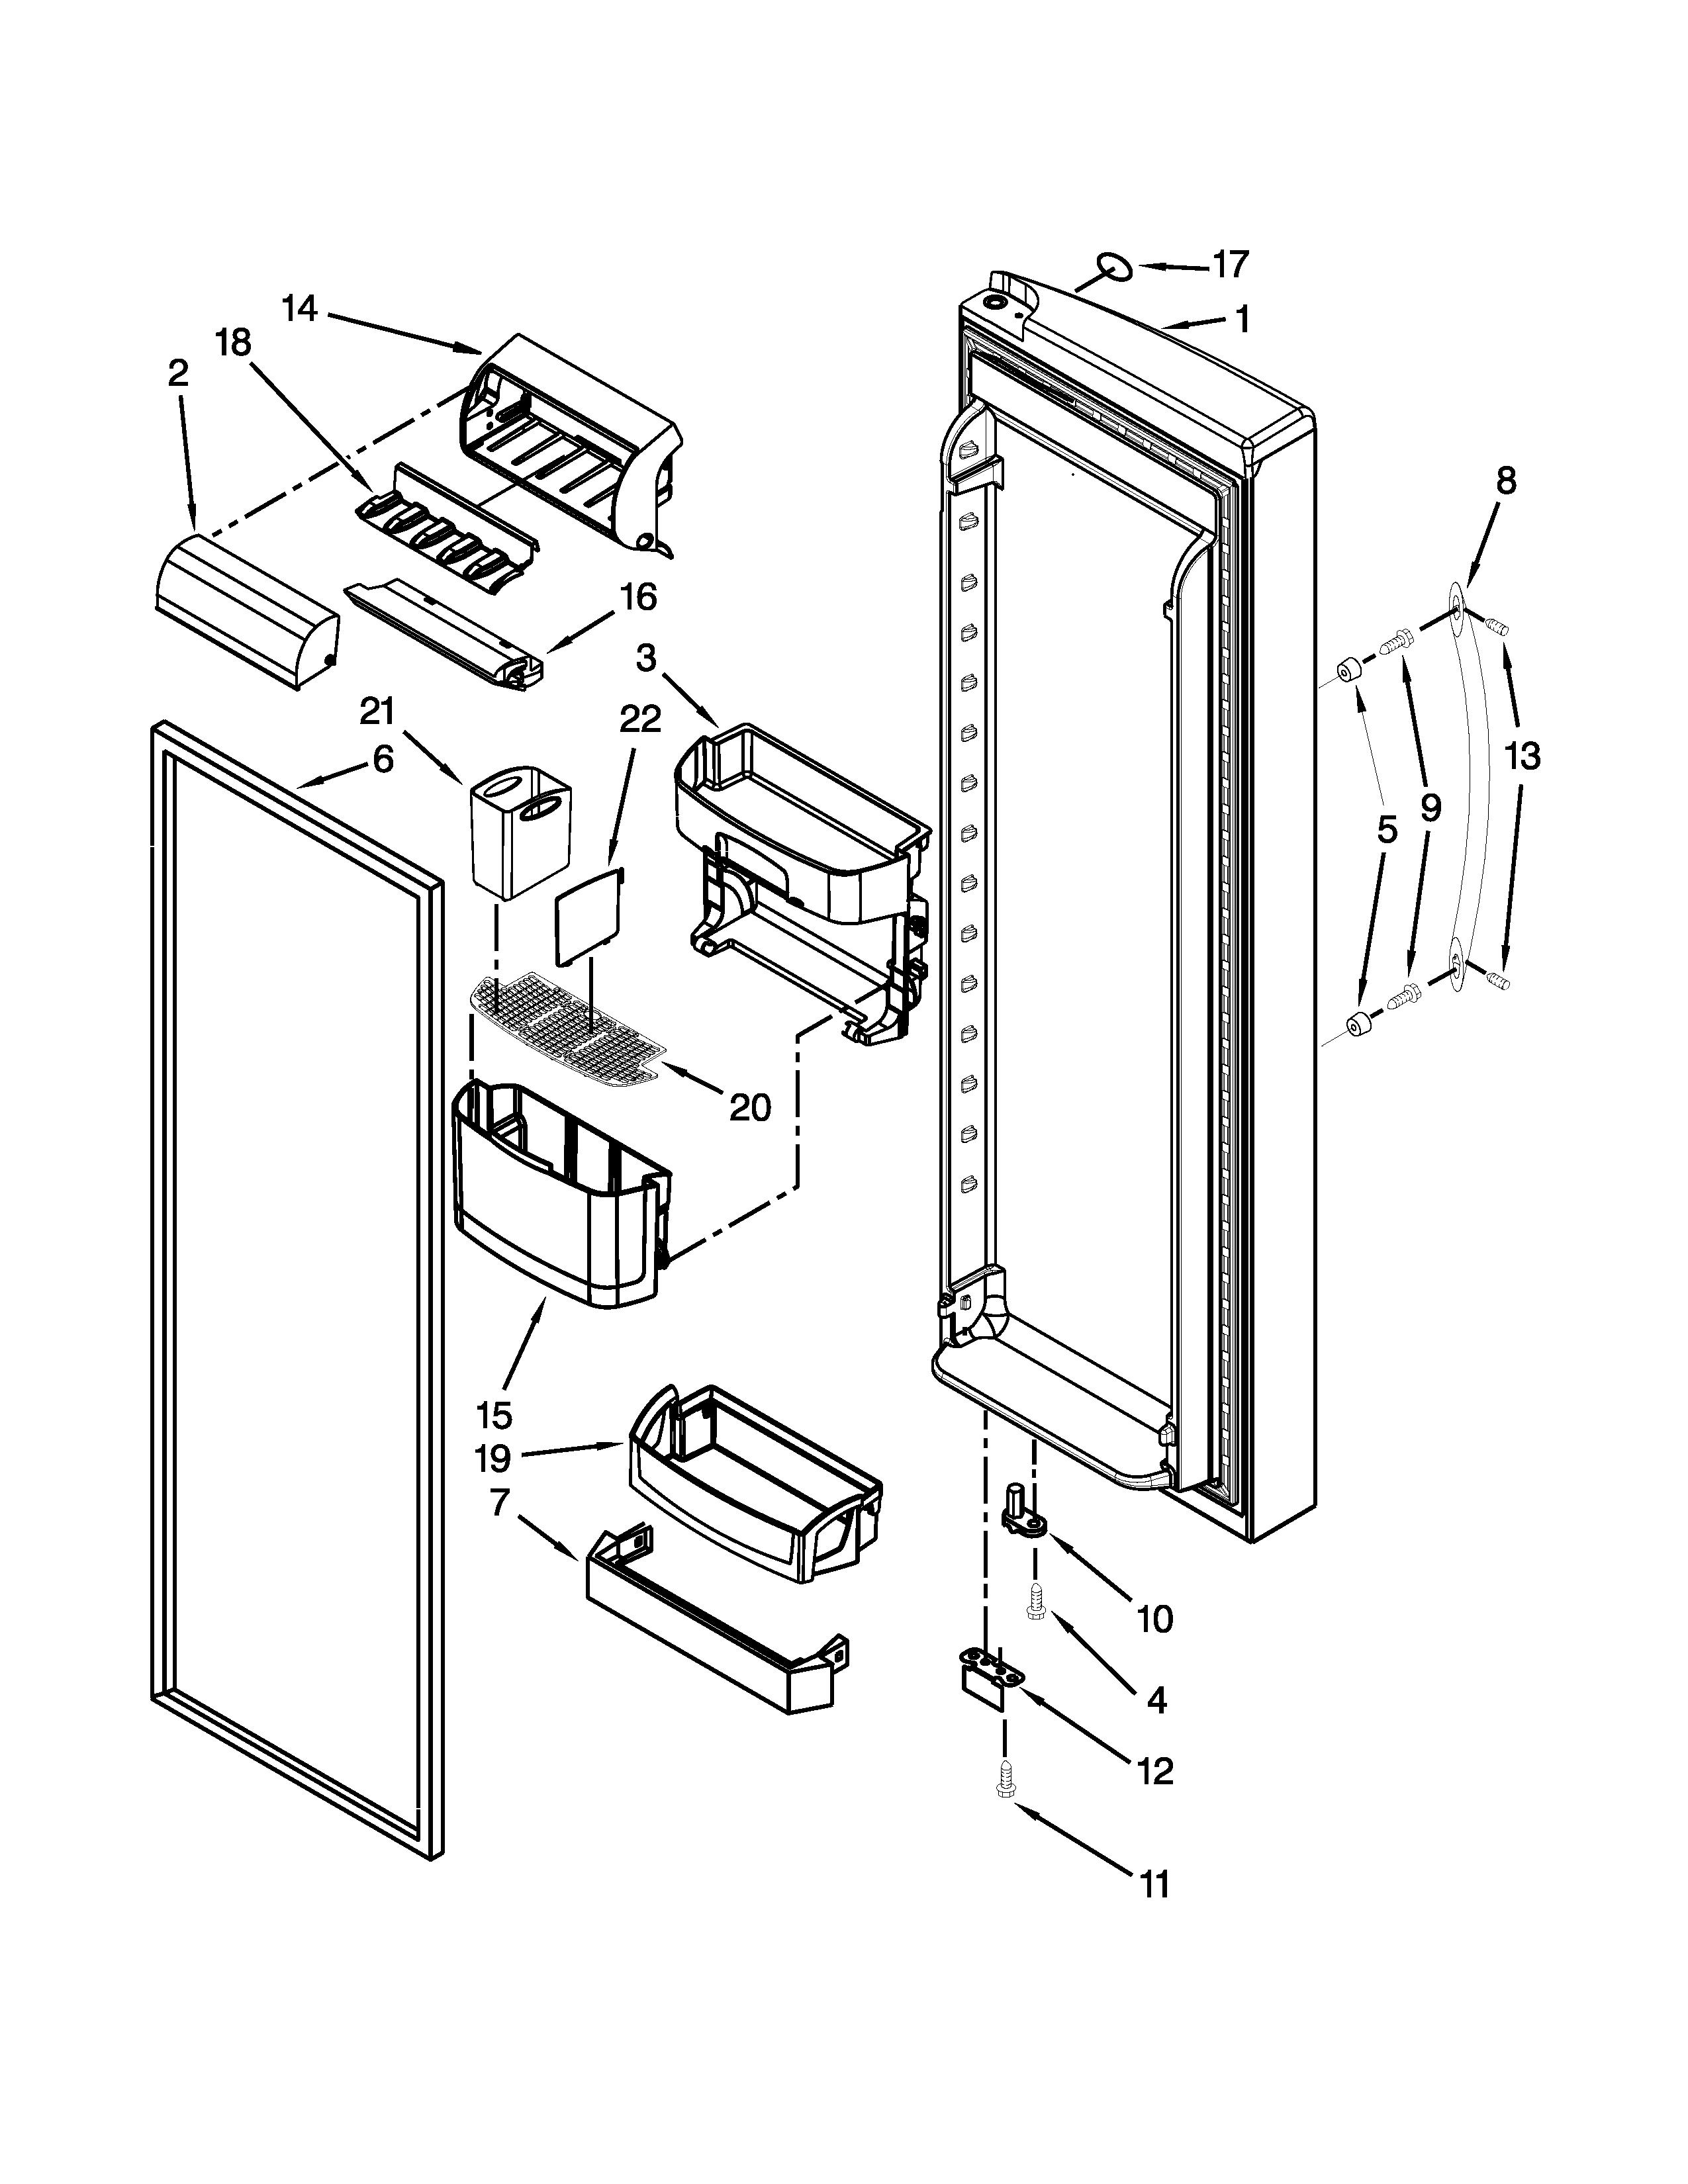 Kenmore-Elite model 10654789801 side-by-side refrigerator